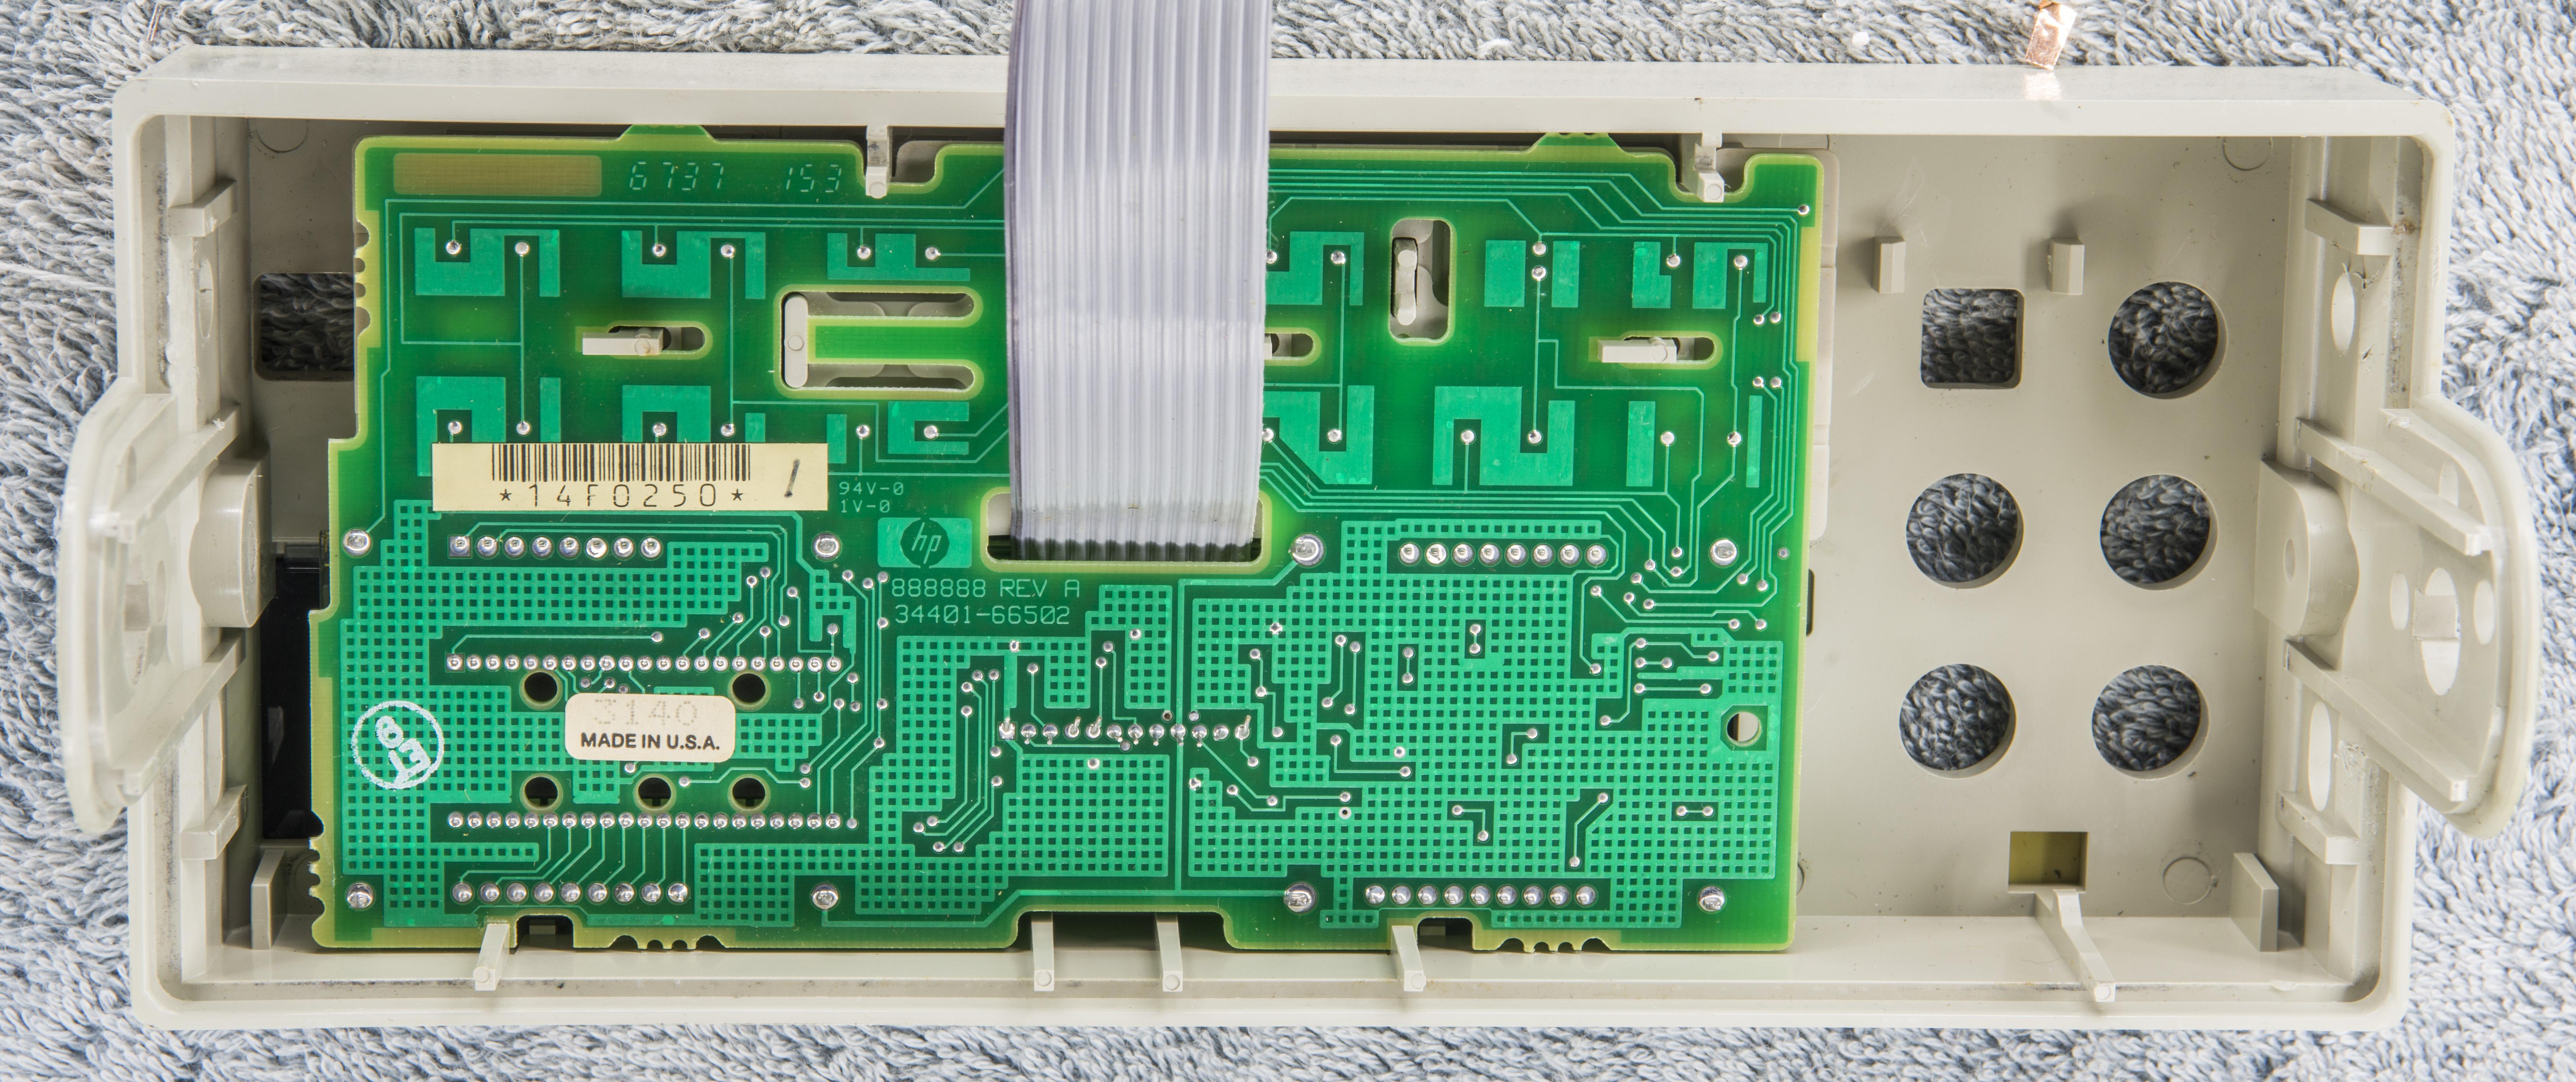 xdevs com hp 34401a repair and calibration worklog rh xdevs com Agilent 34401A Pads LabVIEW Agilent 34401A